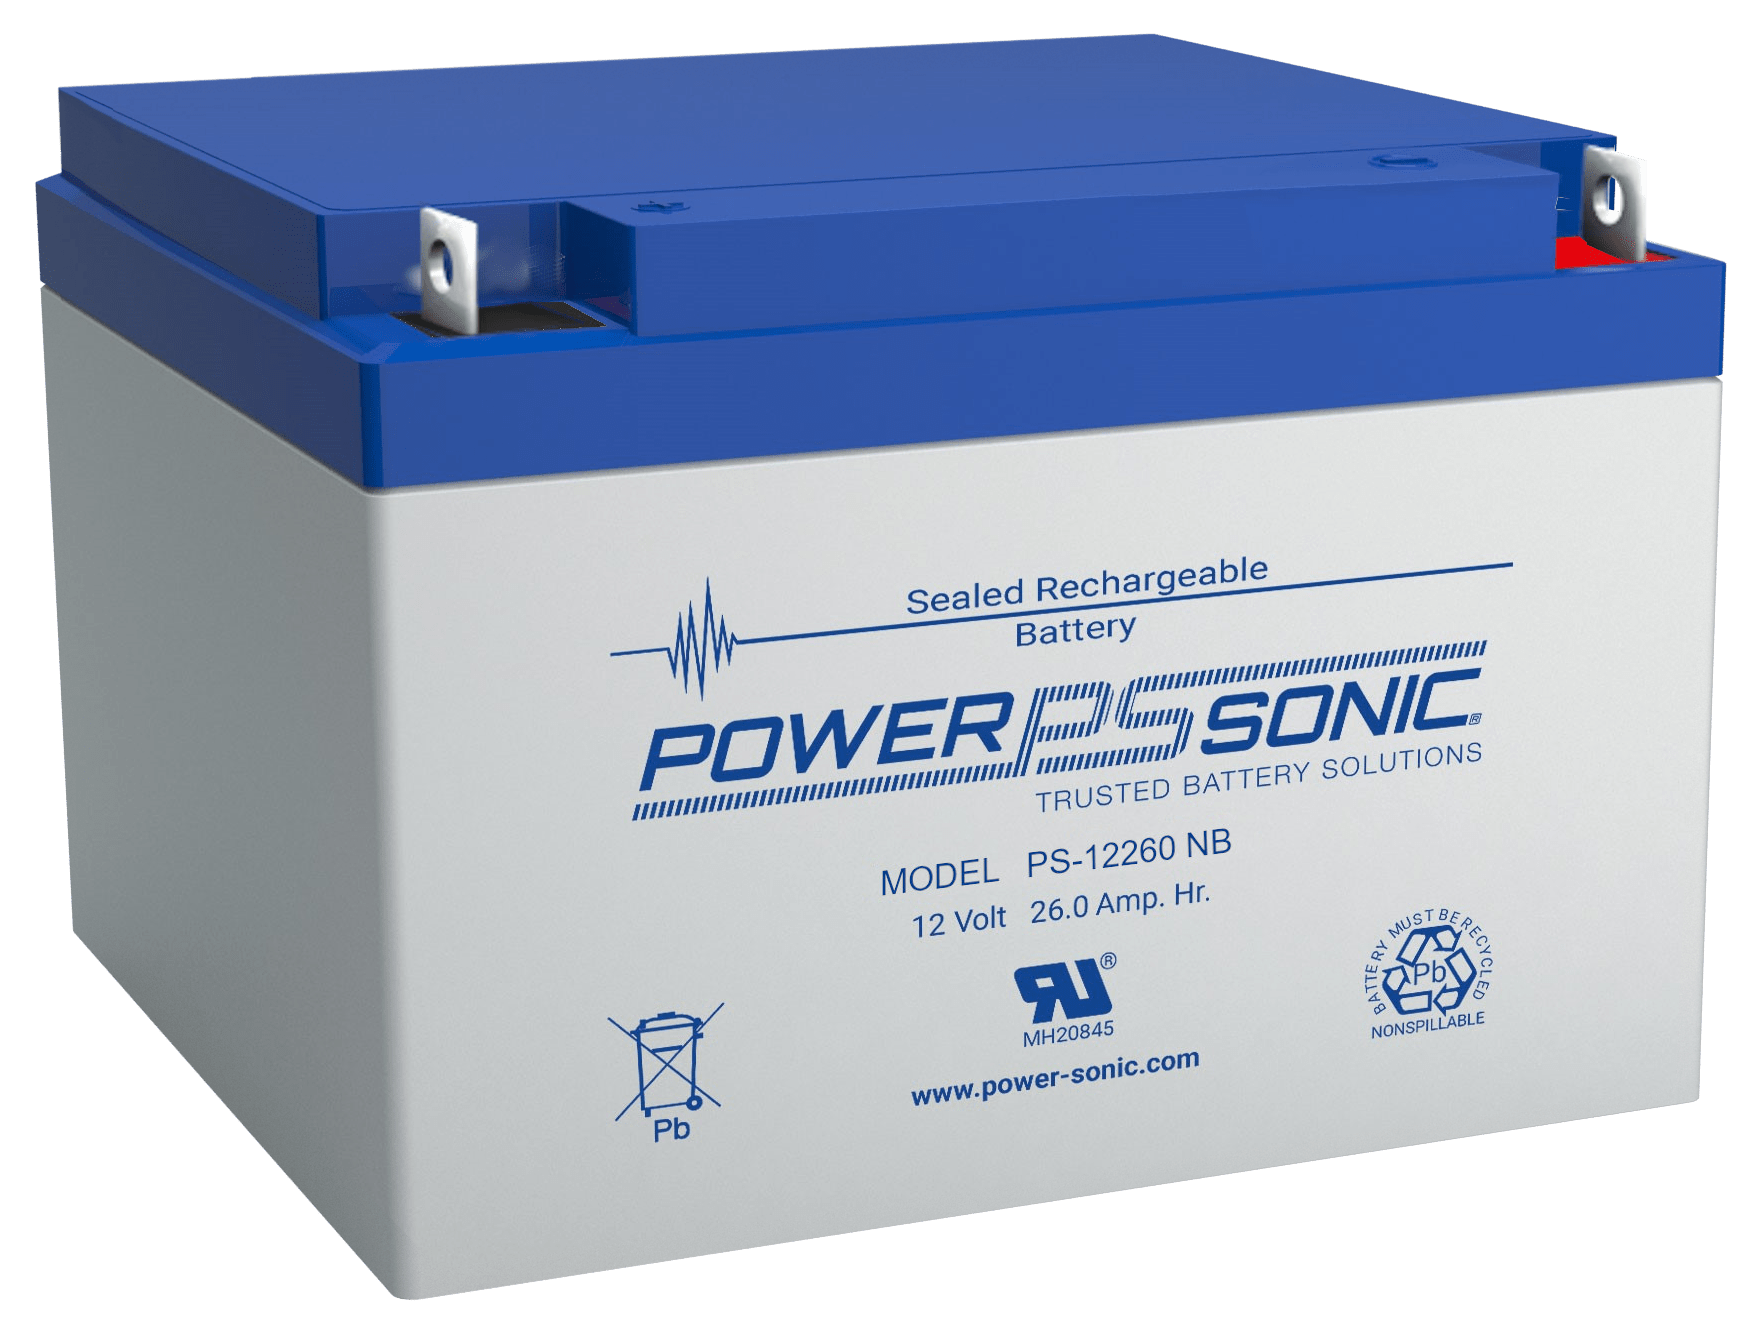 PS-12260